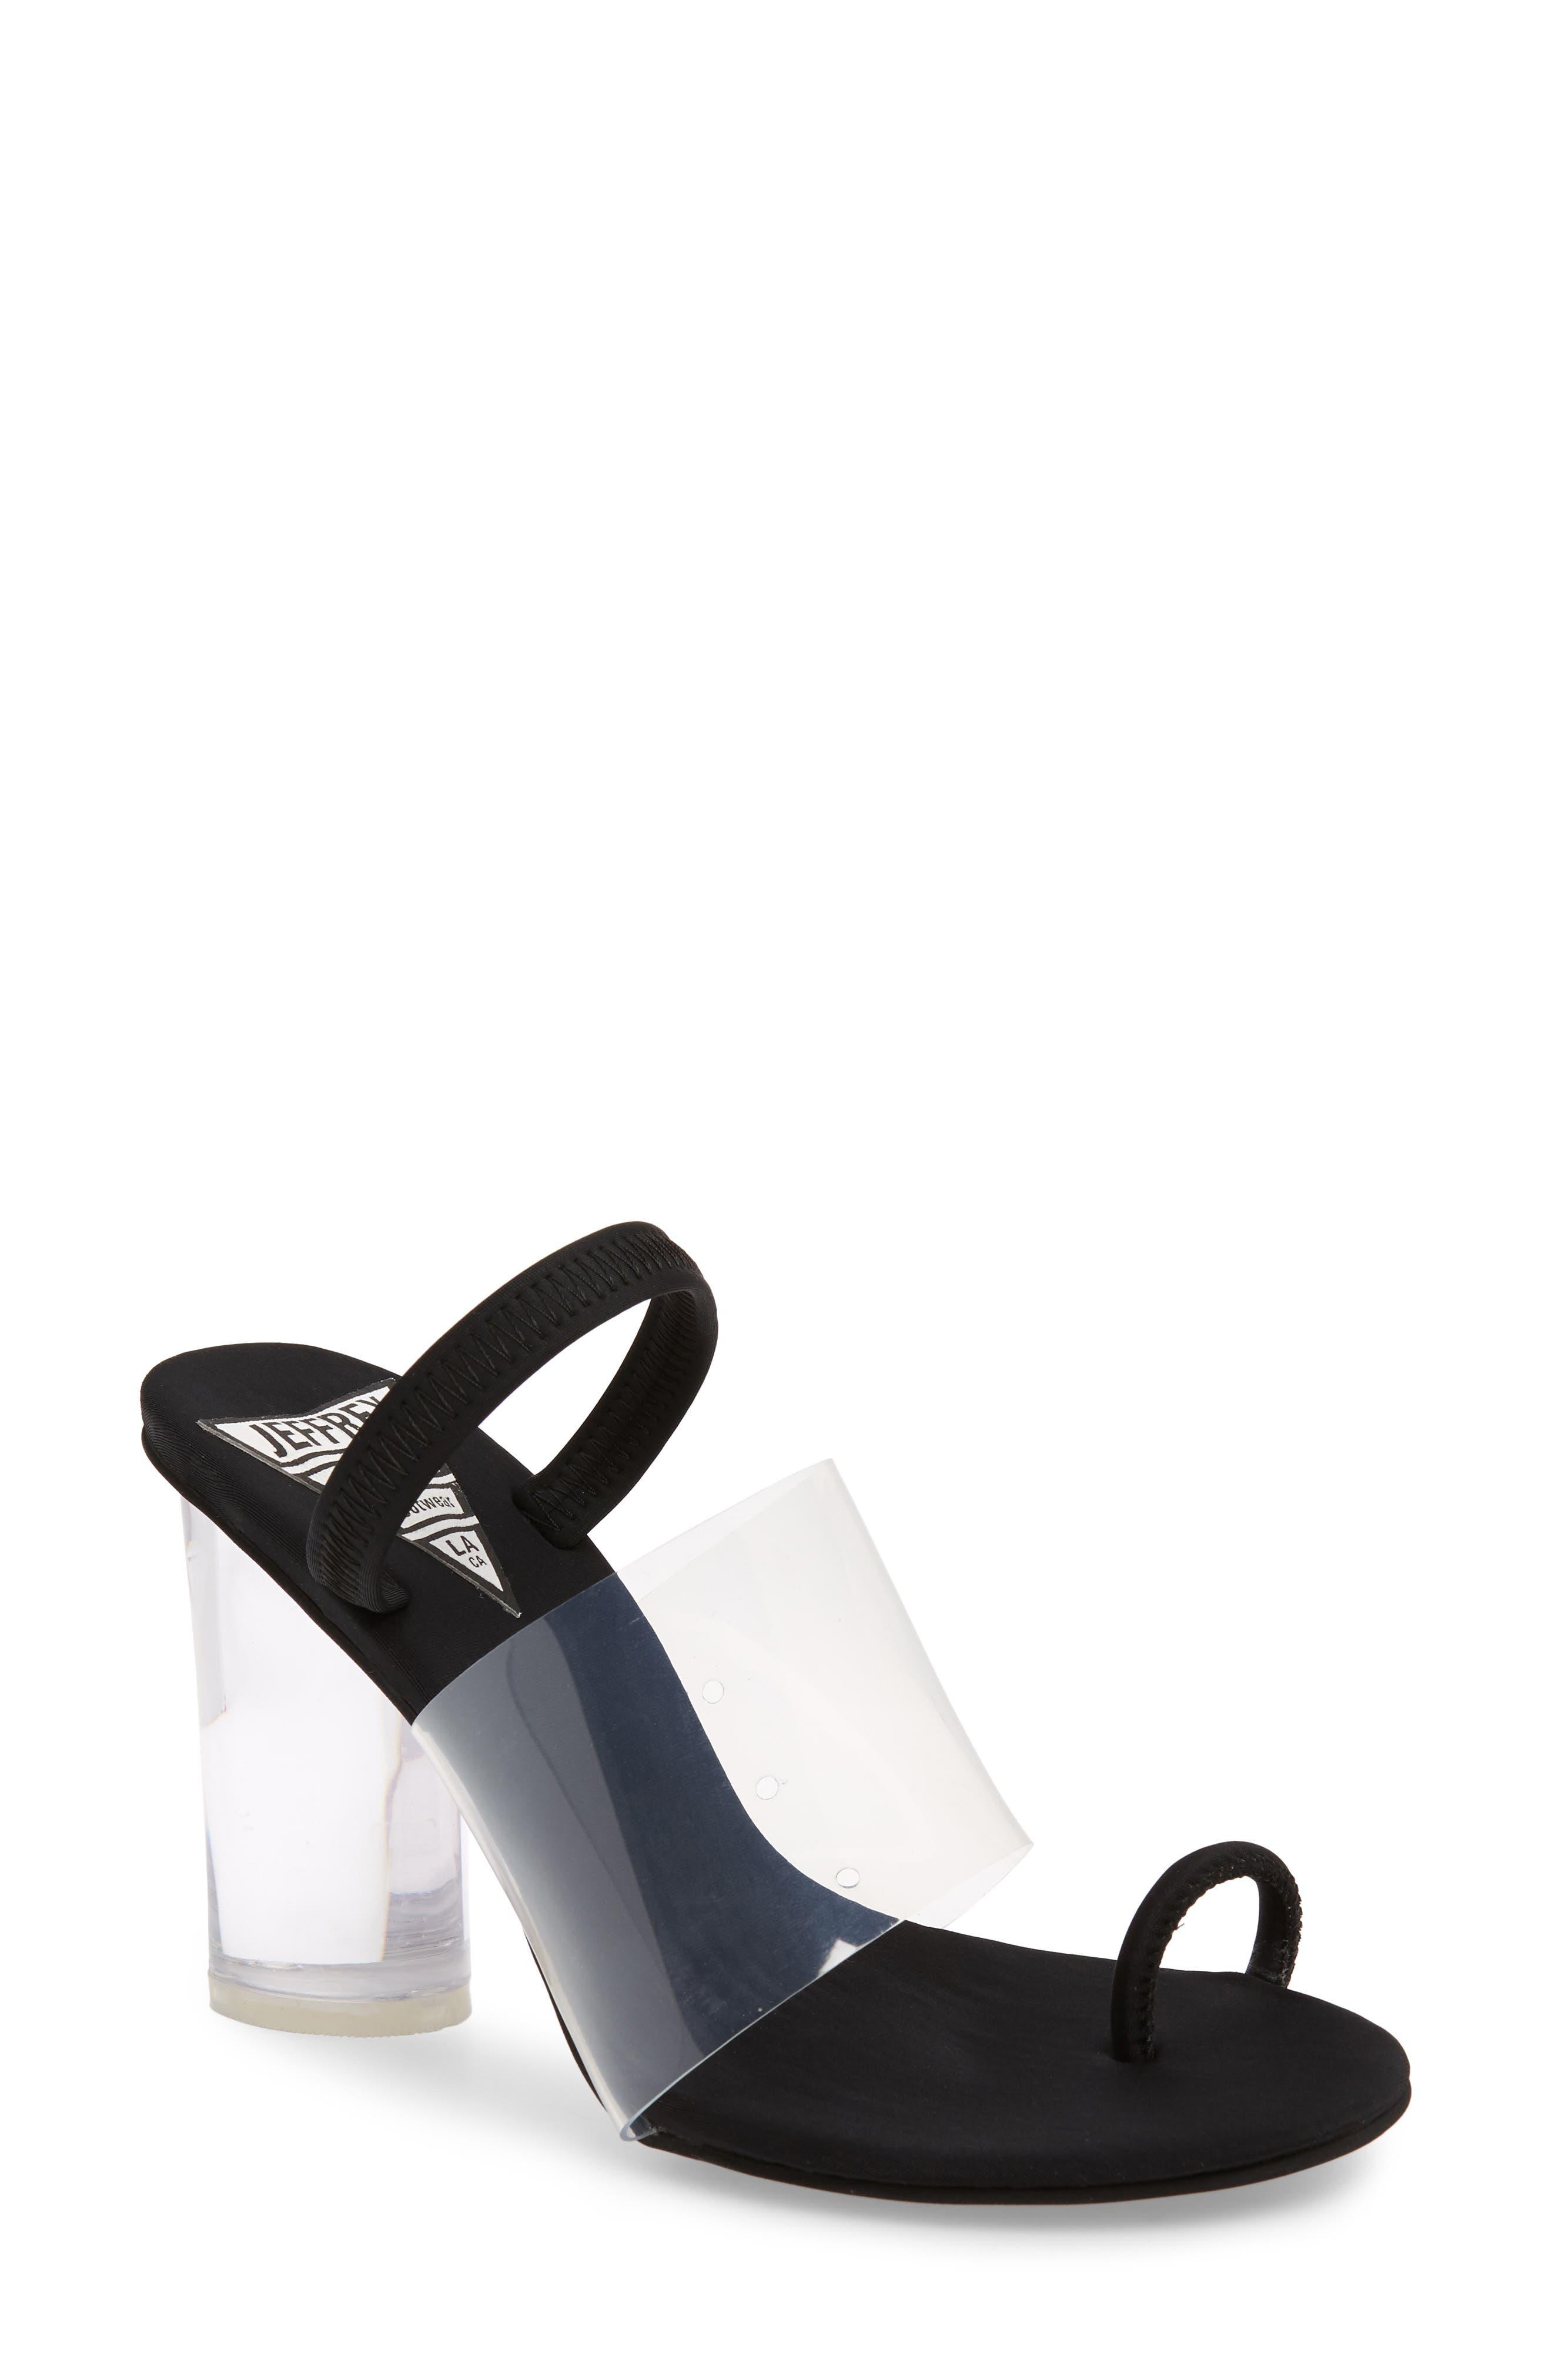 Mania Clear Toe Loop Sandal, Main, color, BLACK FABRIC